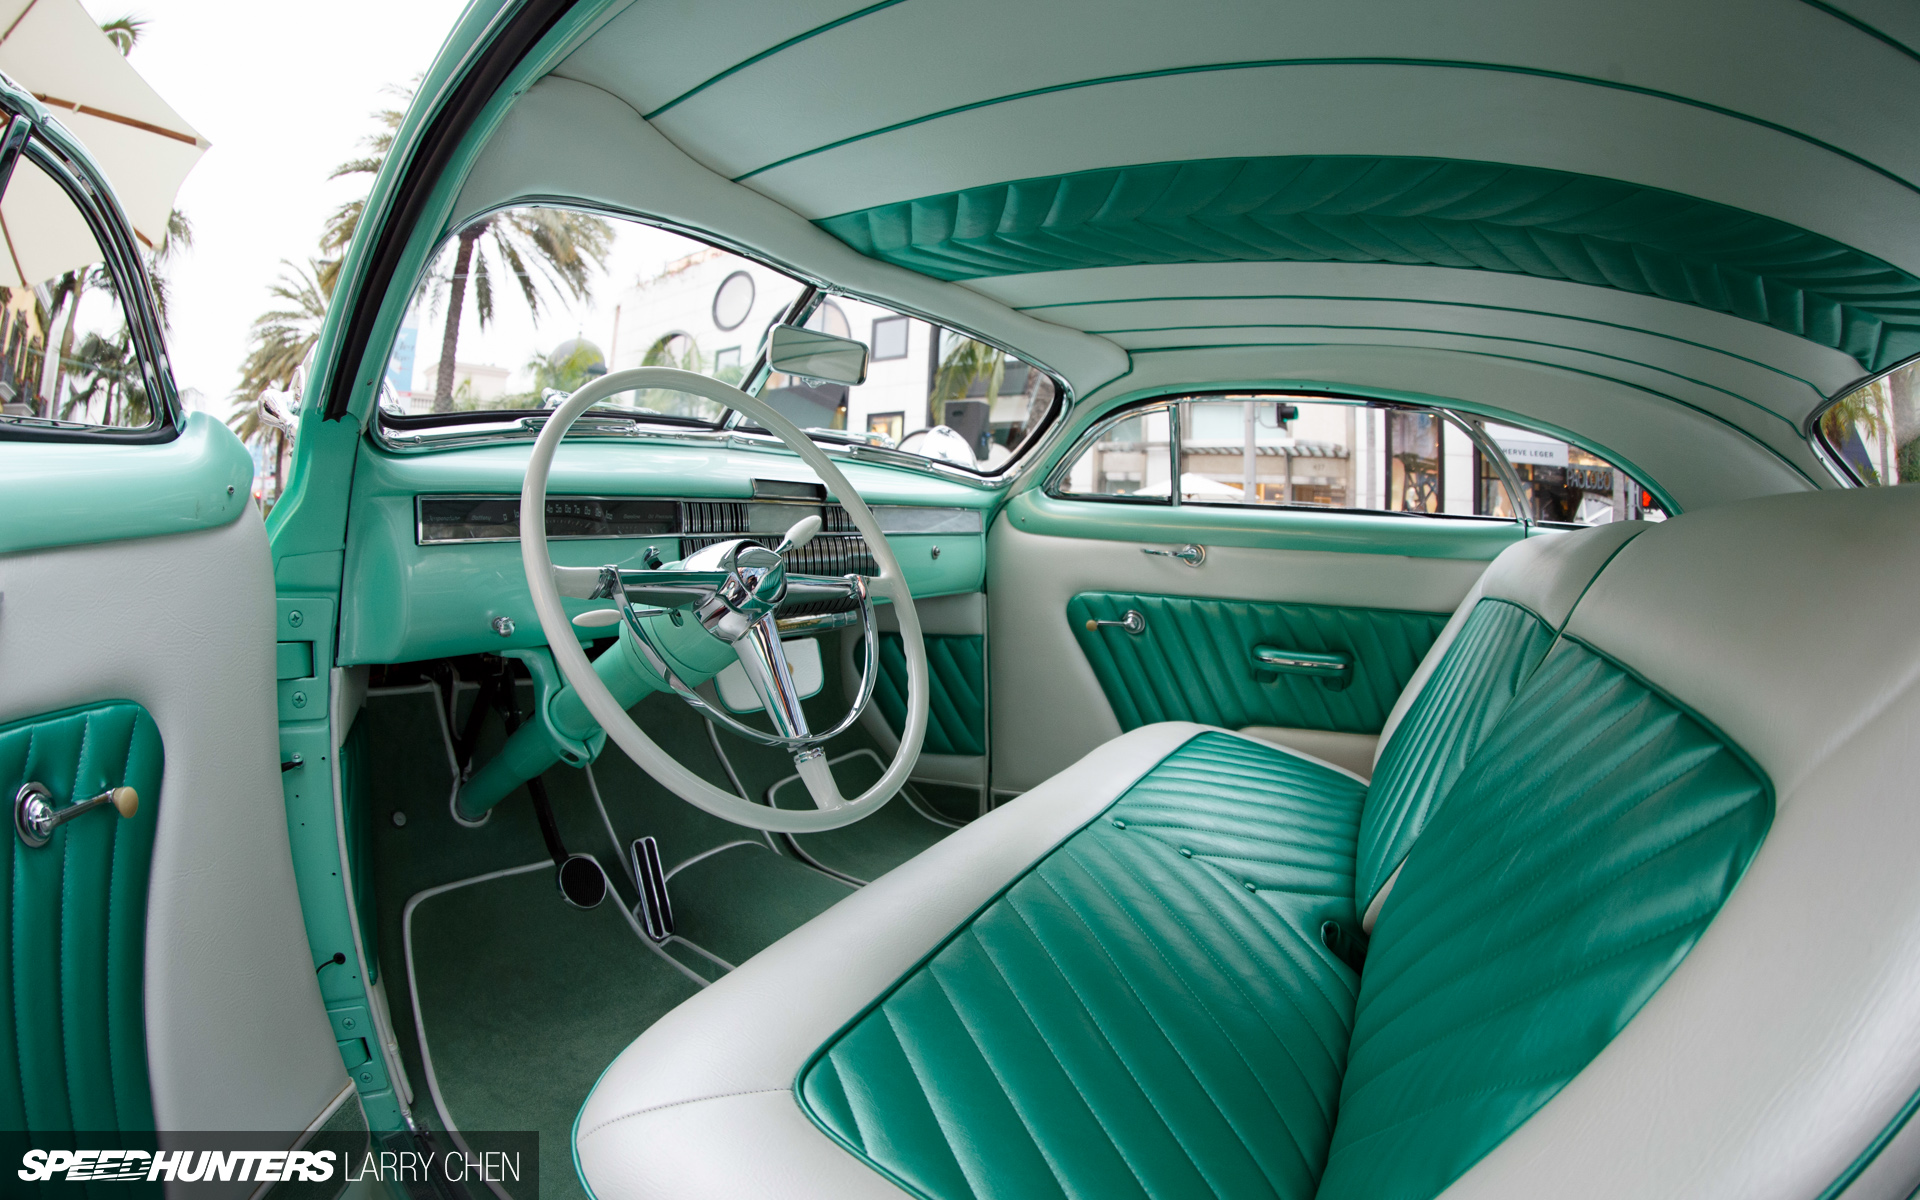 1940 series 62 cadillac lowrider custom retro interior f wallpaper 1920x1200 188306. Black Bedroom Furniture Sets. Home Design Ideas